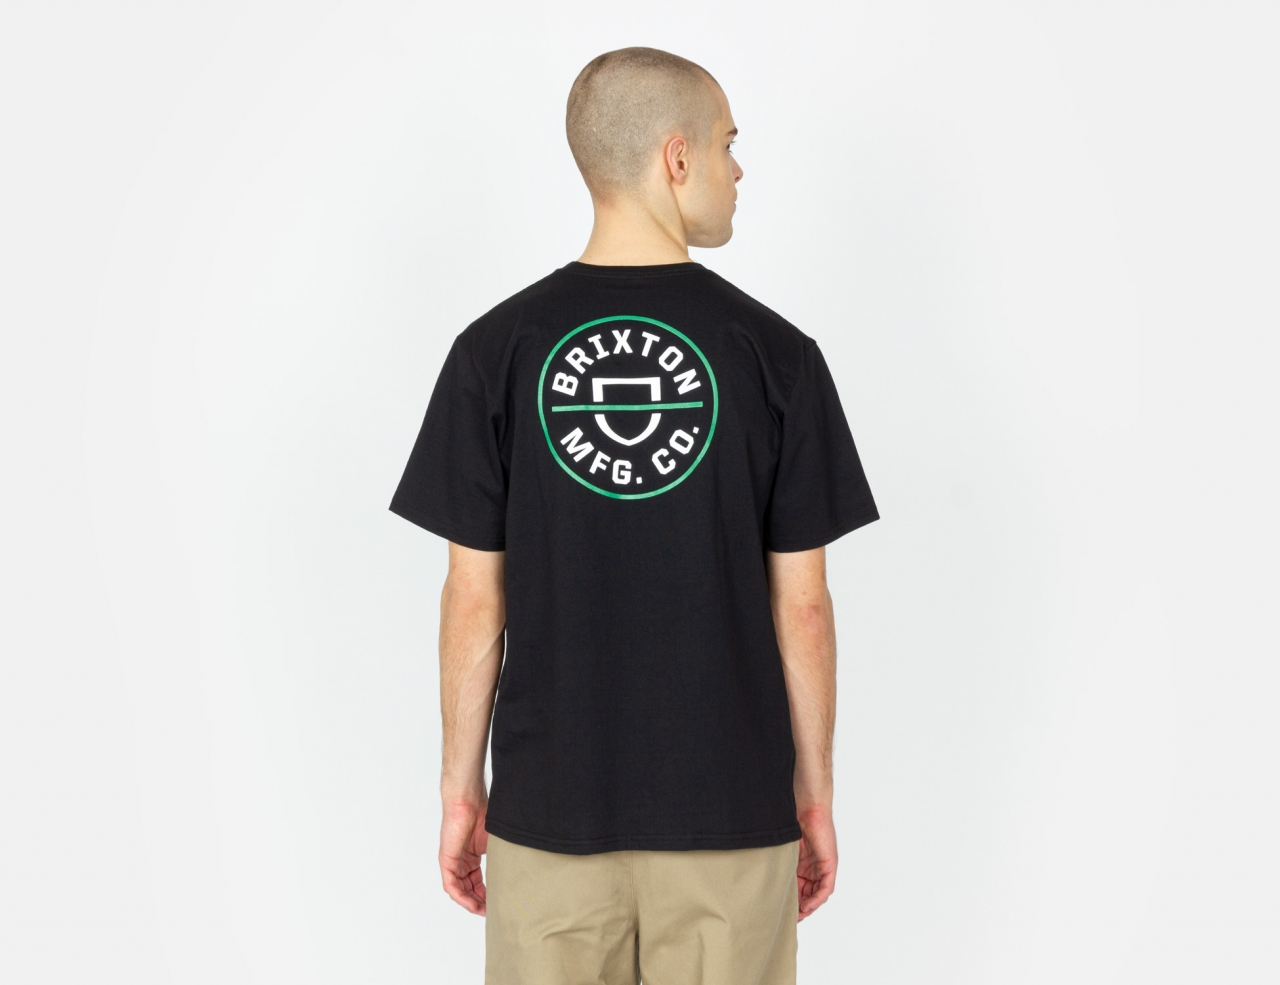 Brixton Crest X T-Shirt - Black